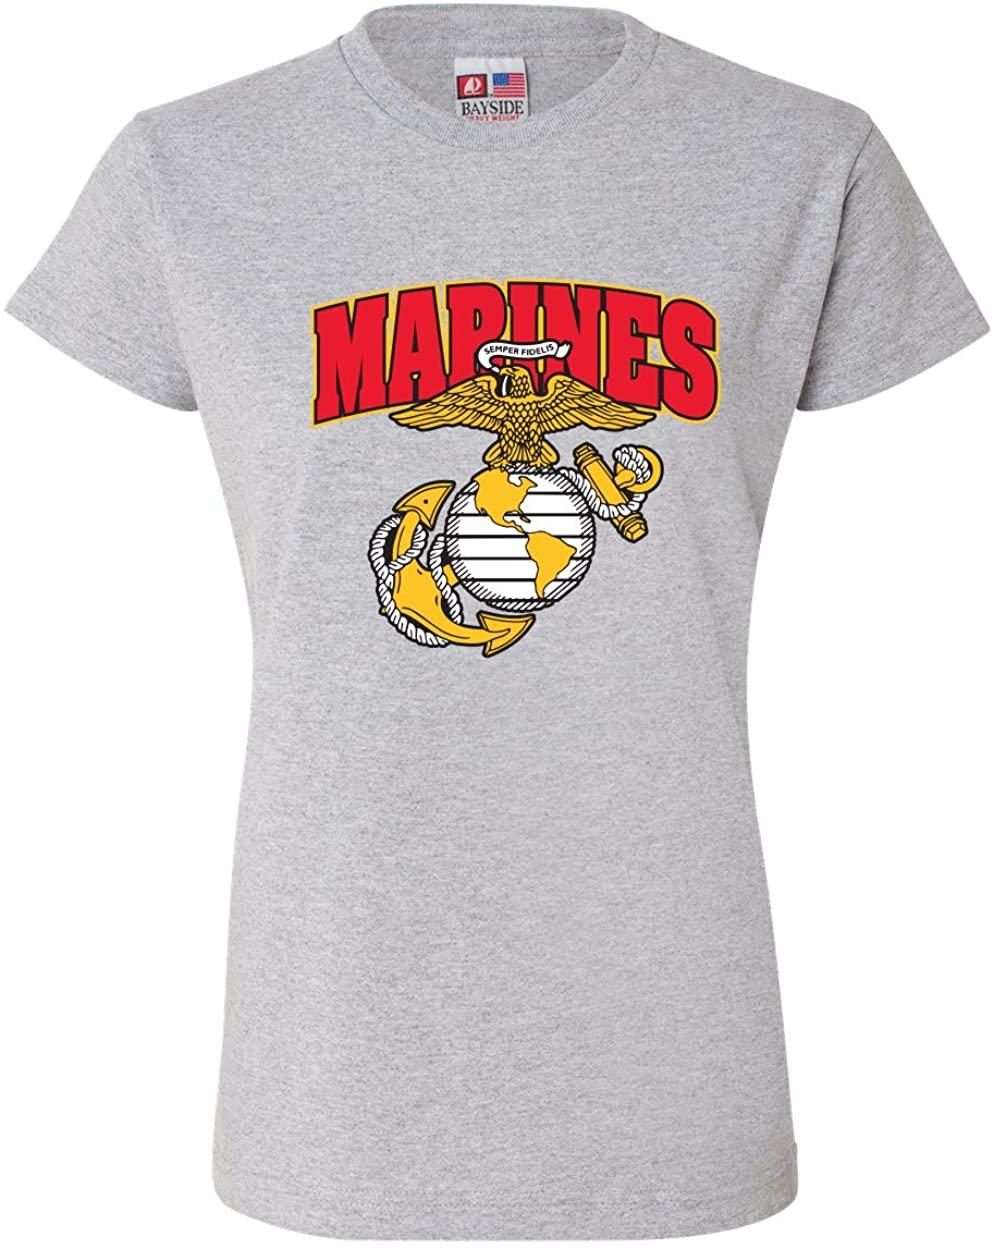 Marines w/Emblem T-Shirt for Women